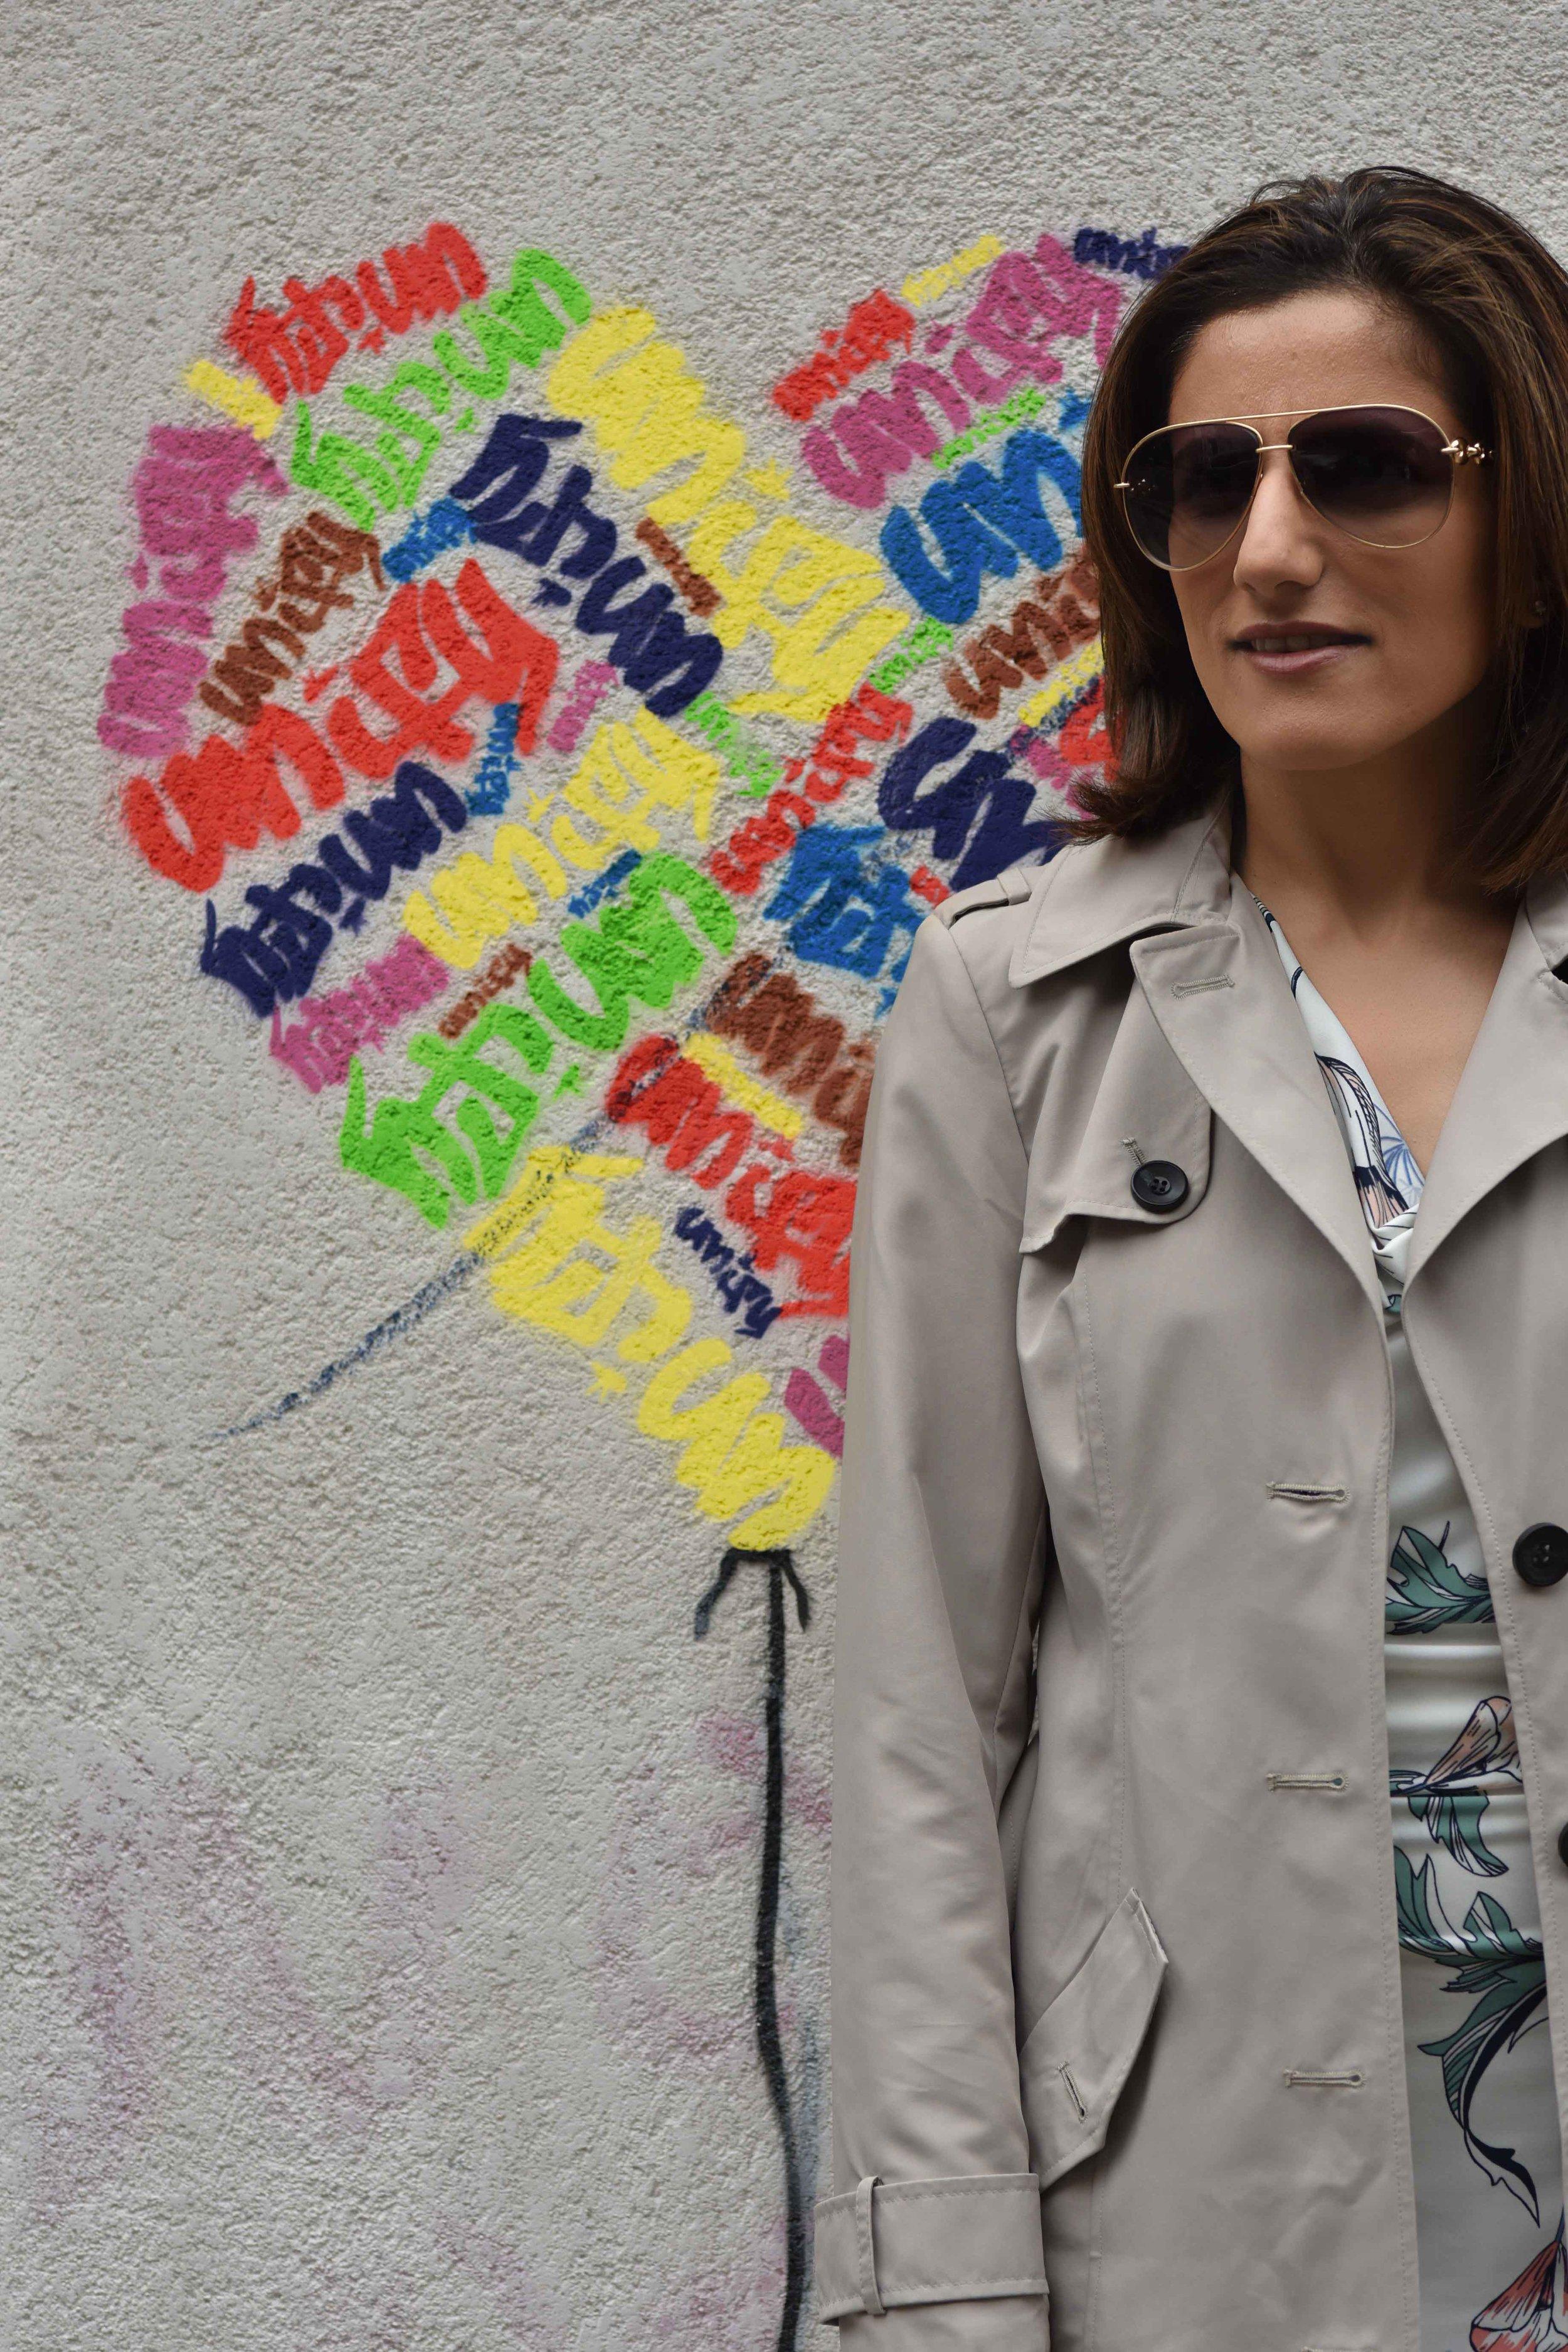 Marks and Spencer shift dress, Marks and Spencer trench, Gucci sunglasses,street fashion, street art, Shoreditch, London, U.K. Photo: Nina Shaw, Image©sourcingstyle.com